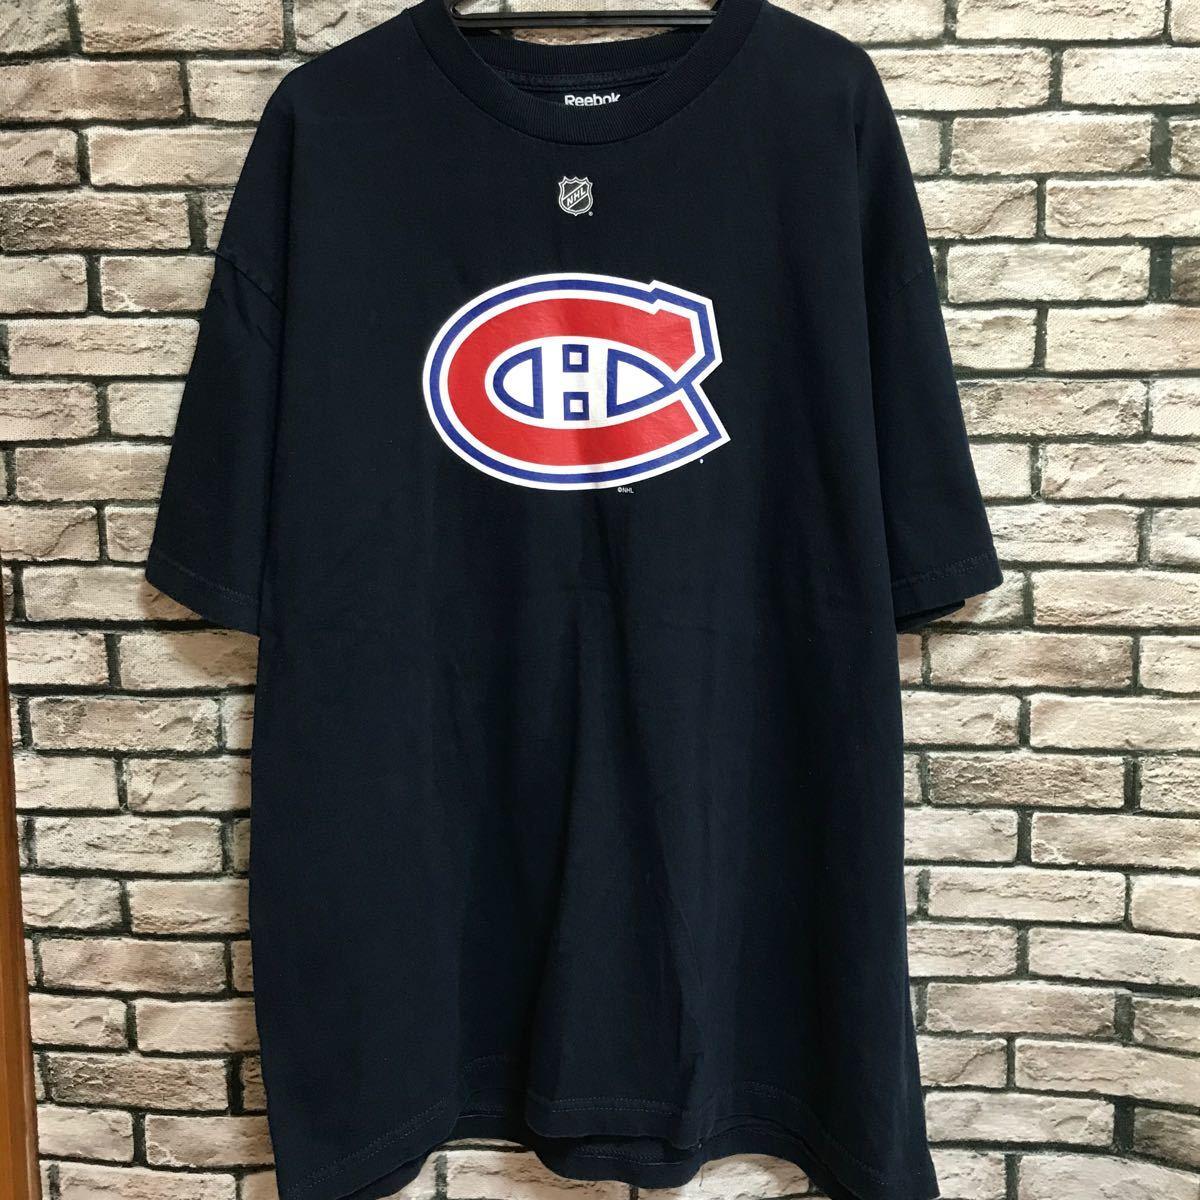 Reebok リーボック NHL モントリオール・カナディアンズ tシャツ 半袖